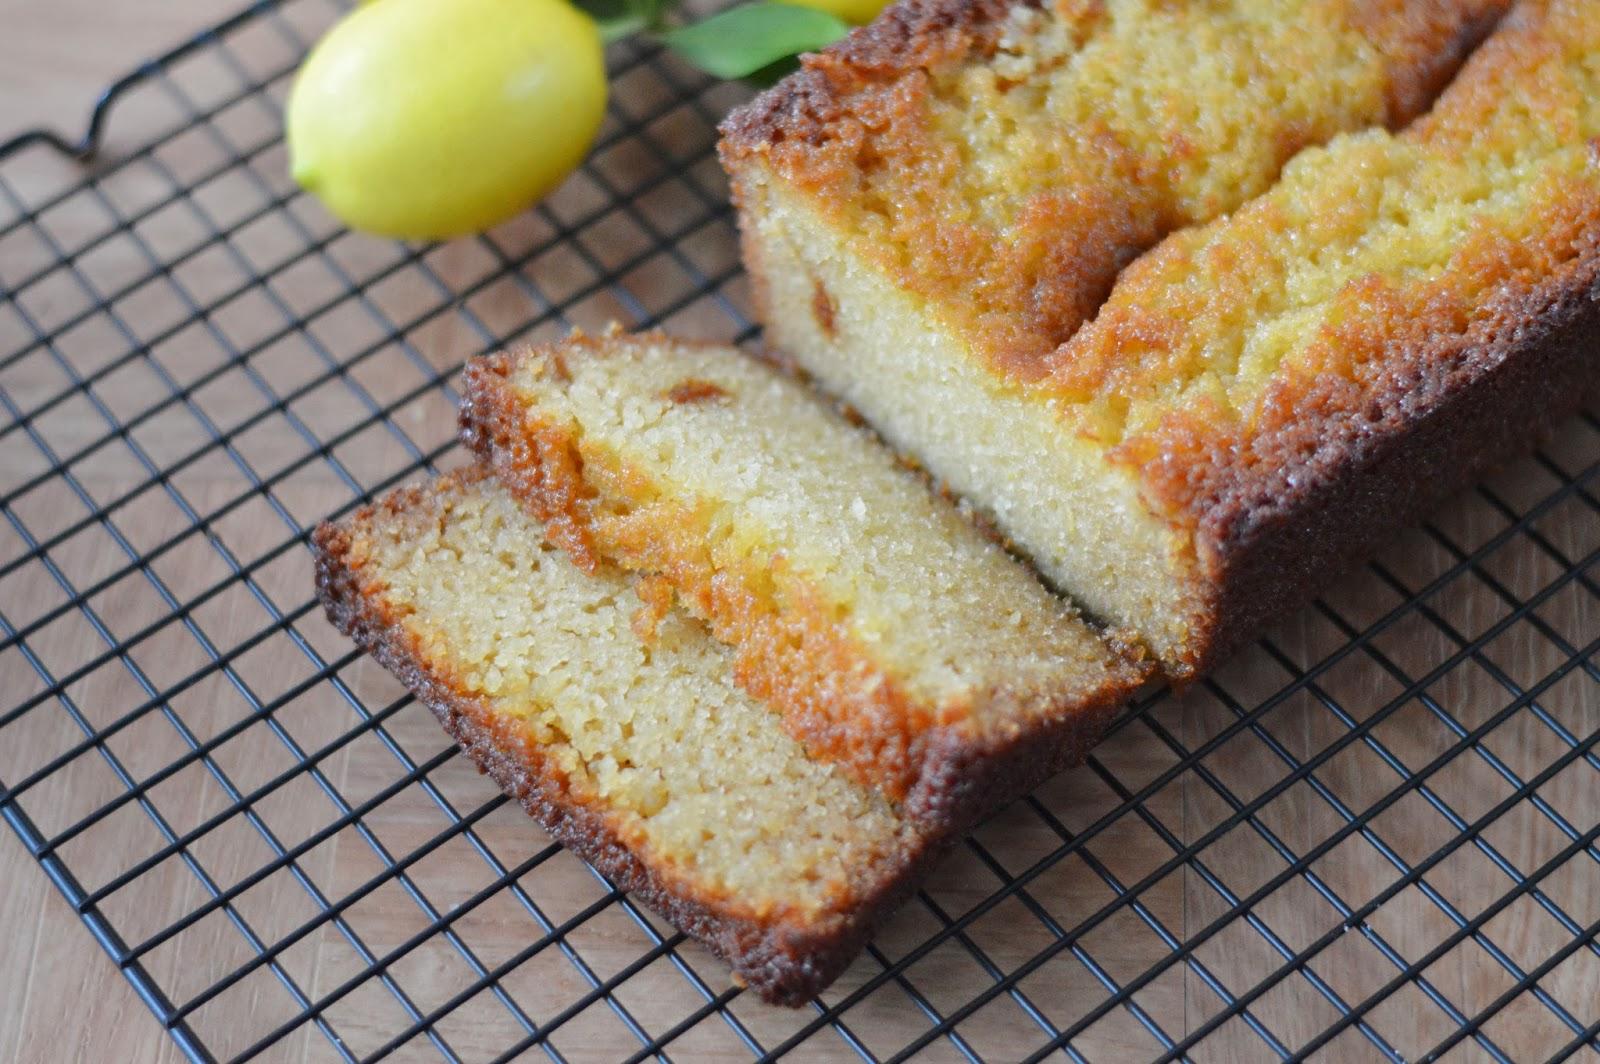 The Art of Comfort Baking: Lemon Ricotta Pound Cake